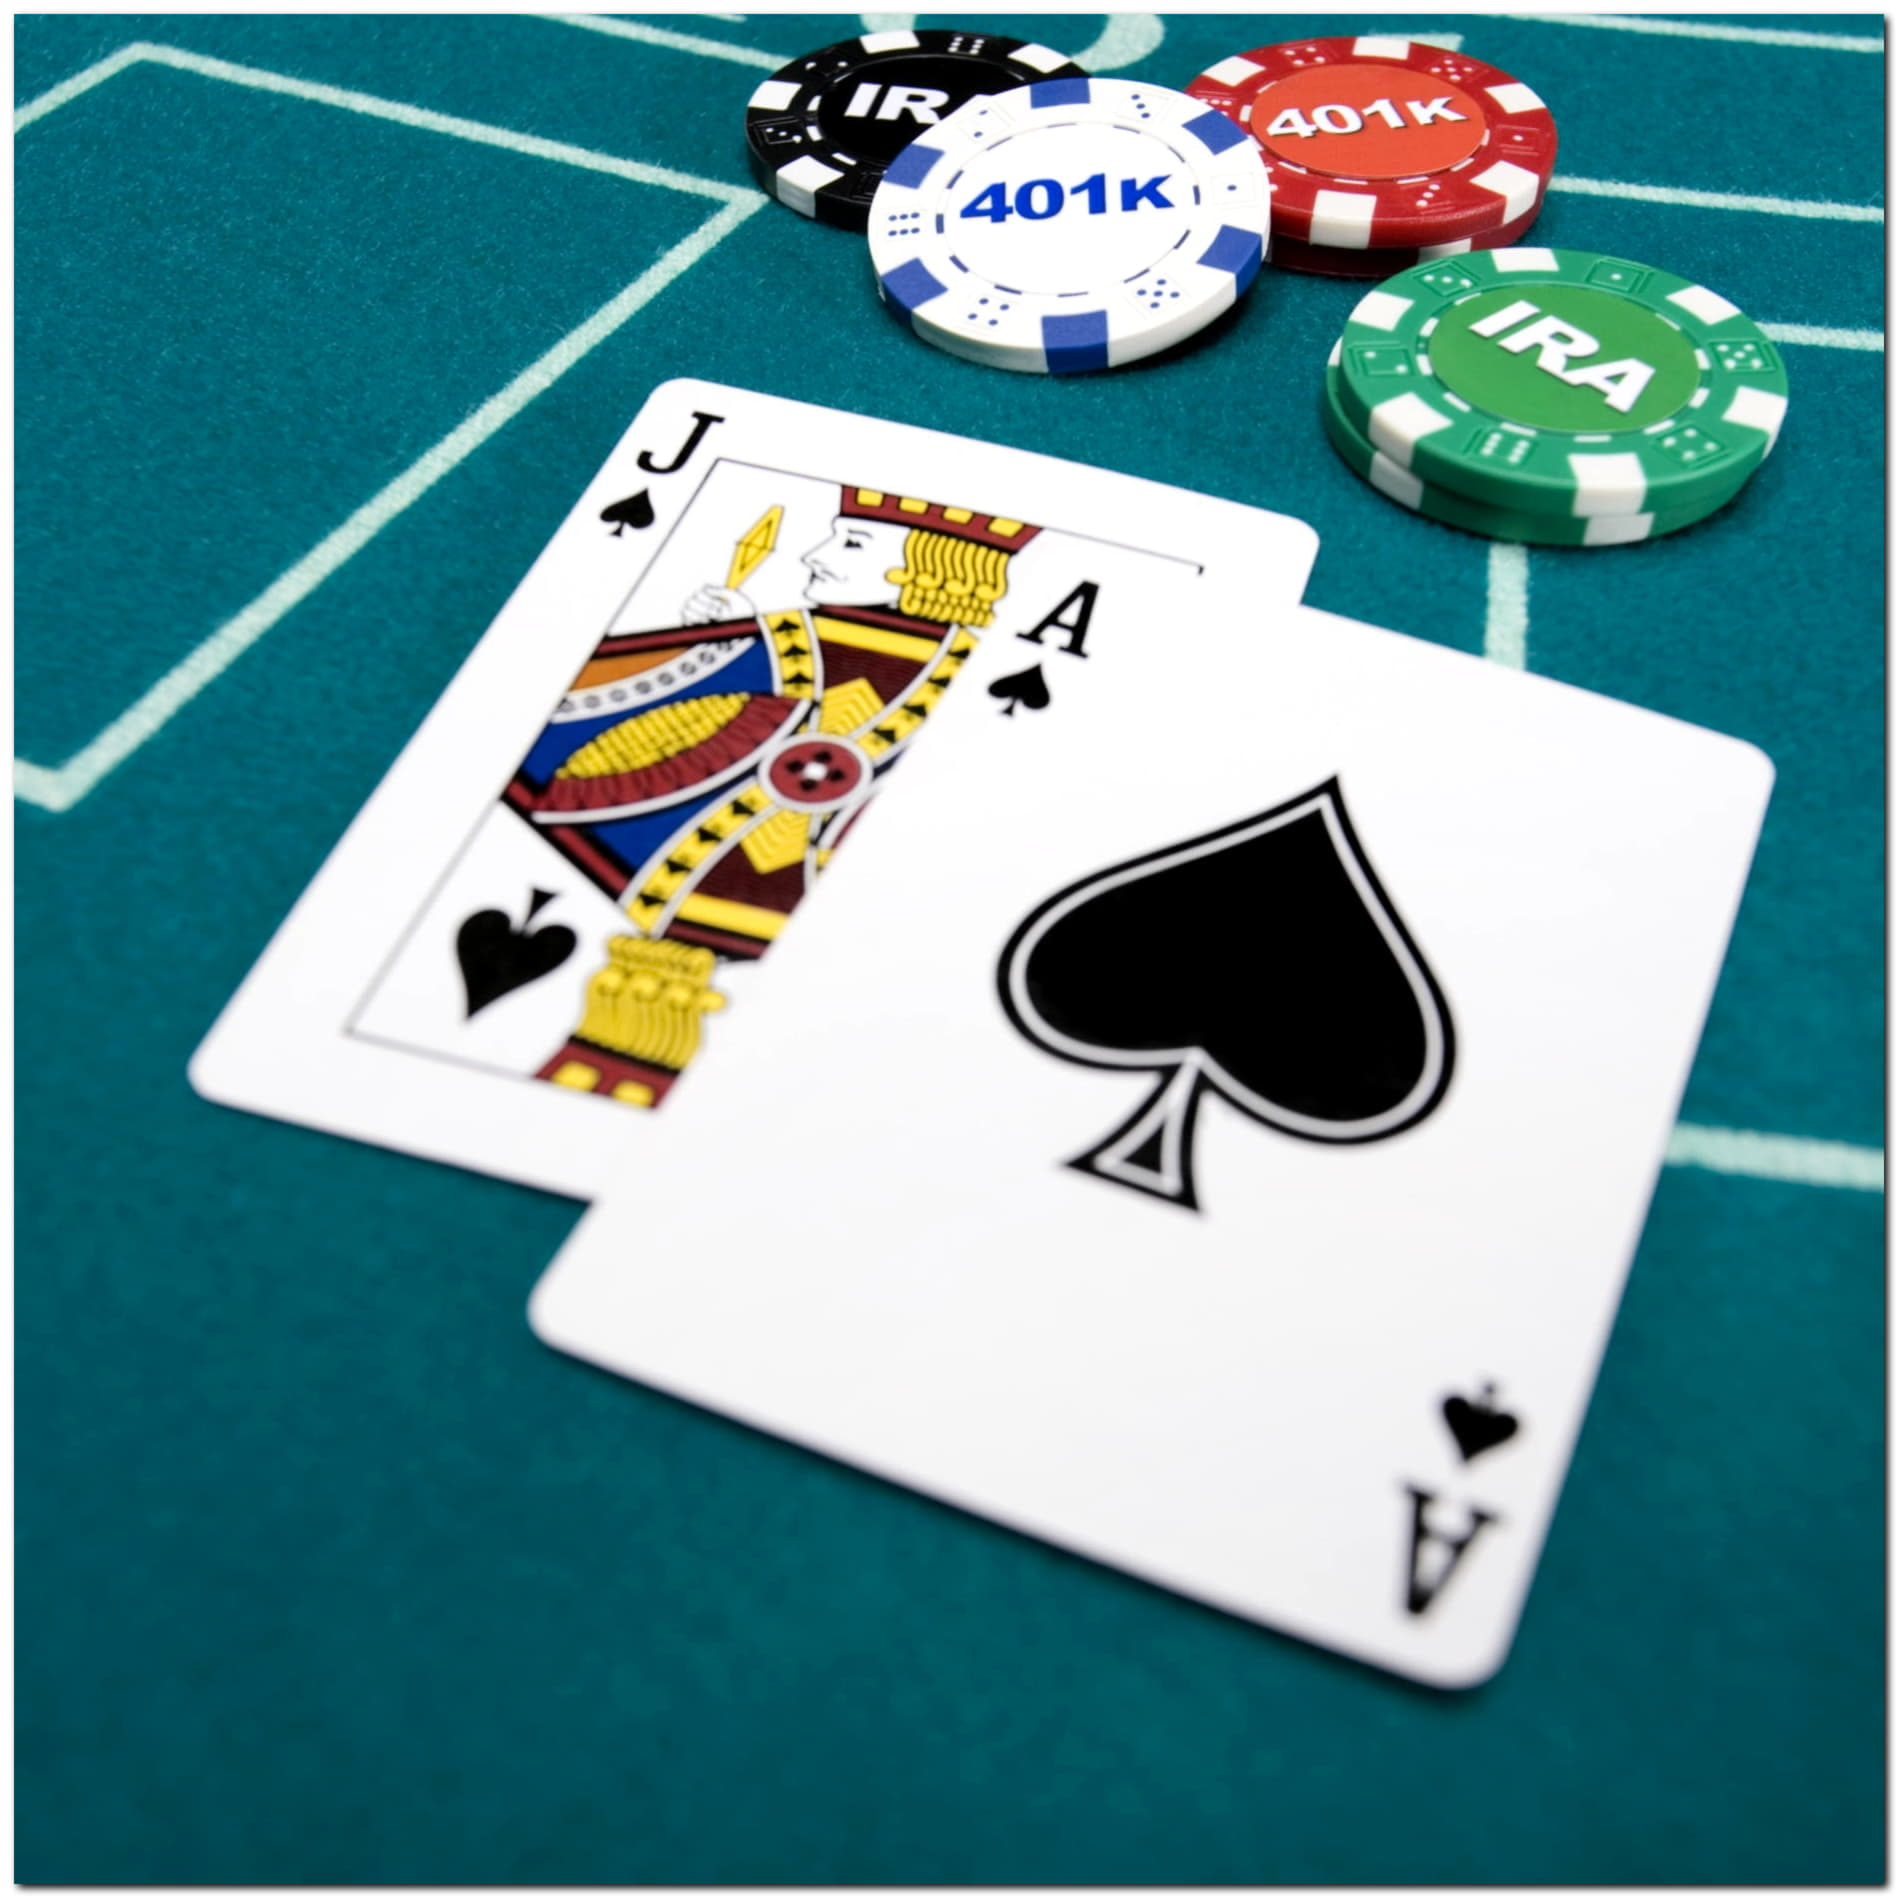 35 FREE SPINS at Wunderino Casino